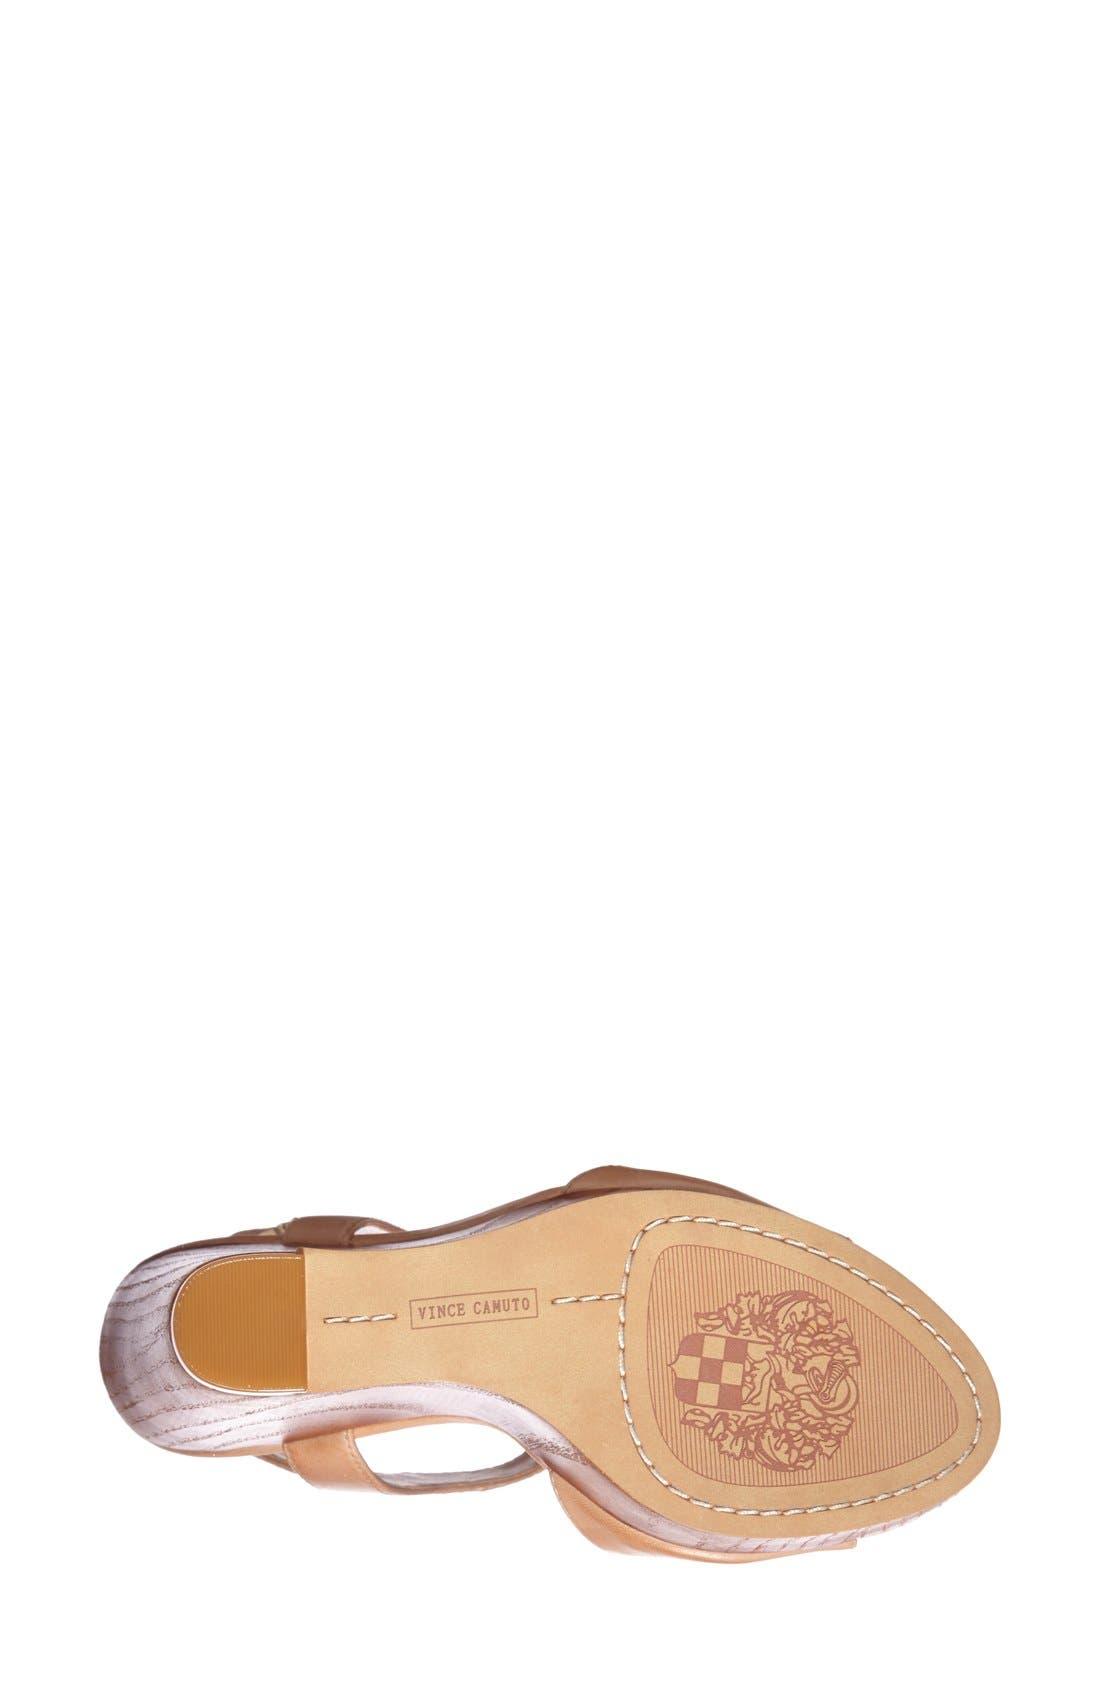 Alternate Image 4  - Vince Camuto 'Mathis' T-Strap Wedge Sandal (Women)